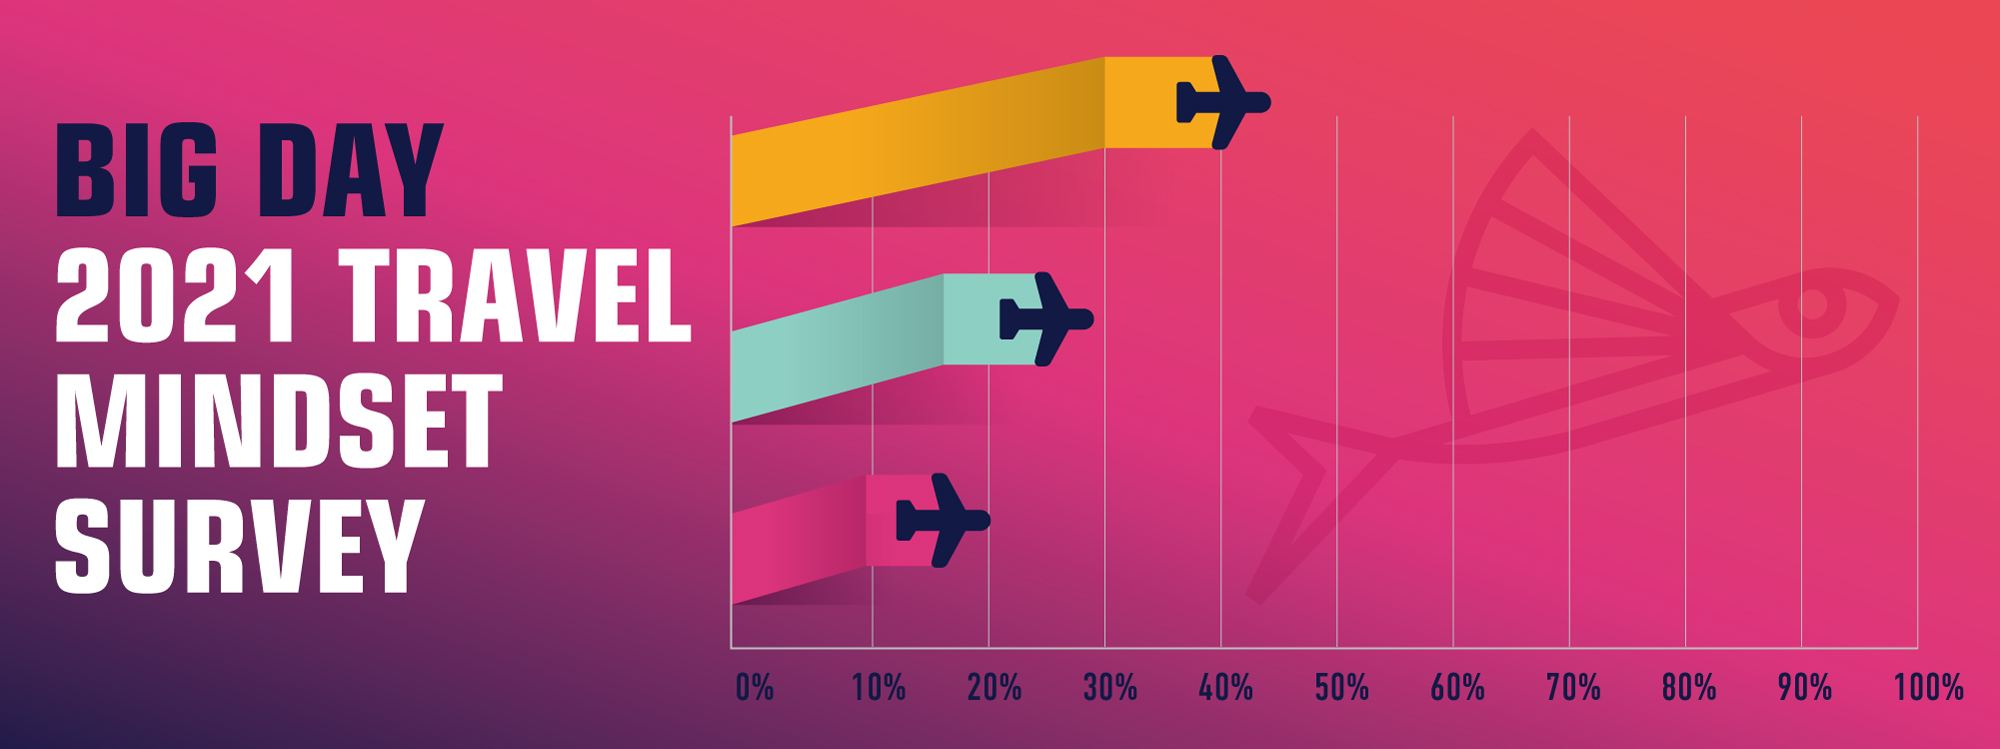 Travel Mindset Survey Uncovers Trends